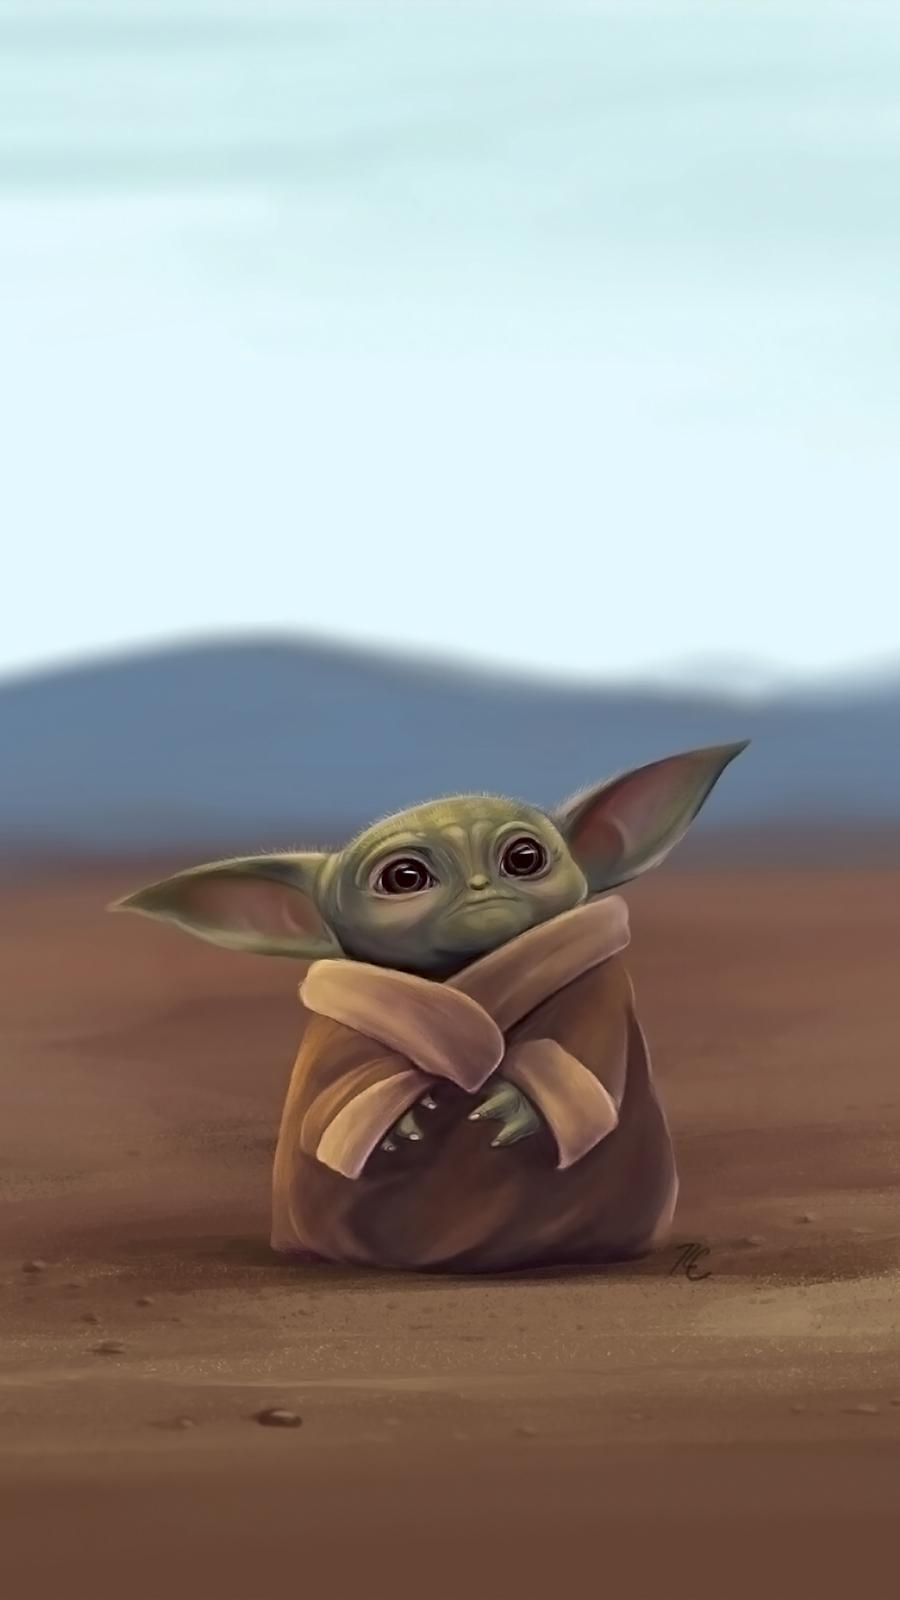 The Child Baby Yoda Phone Wallpaper Collection Cool Wallpapers Heroscreen Cc Yoda Wallpaper Yoda Art Star Wars Art